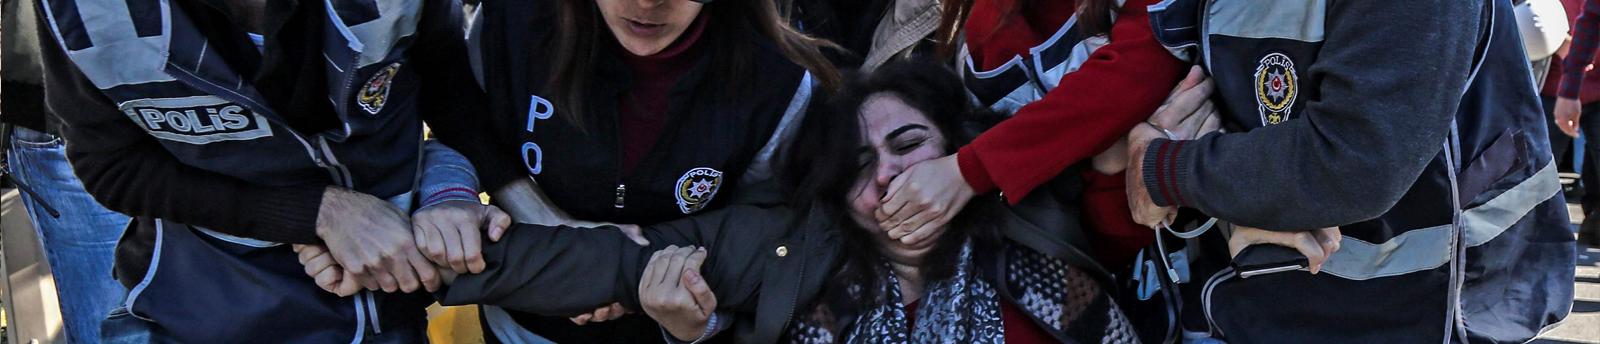 Foto: TT/AFP